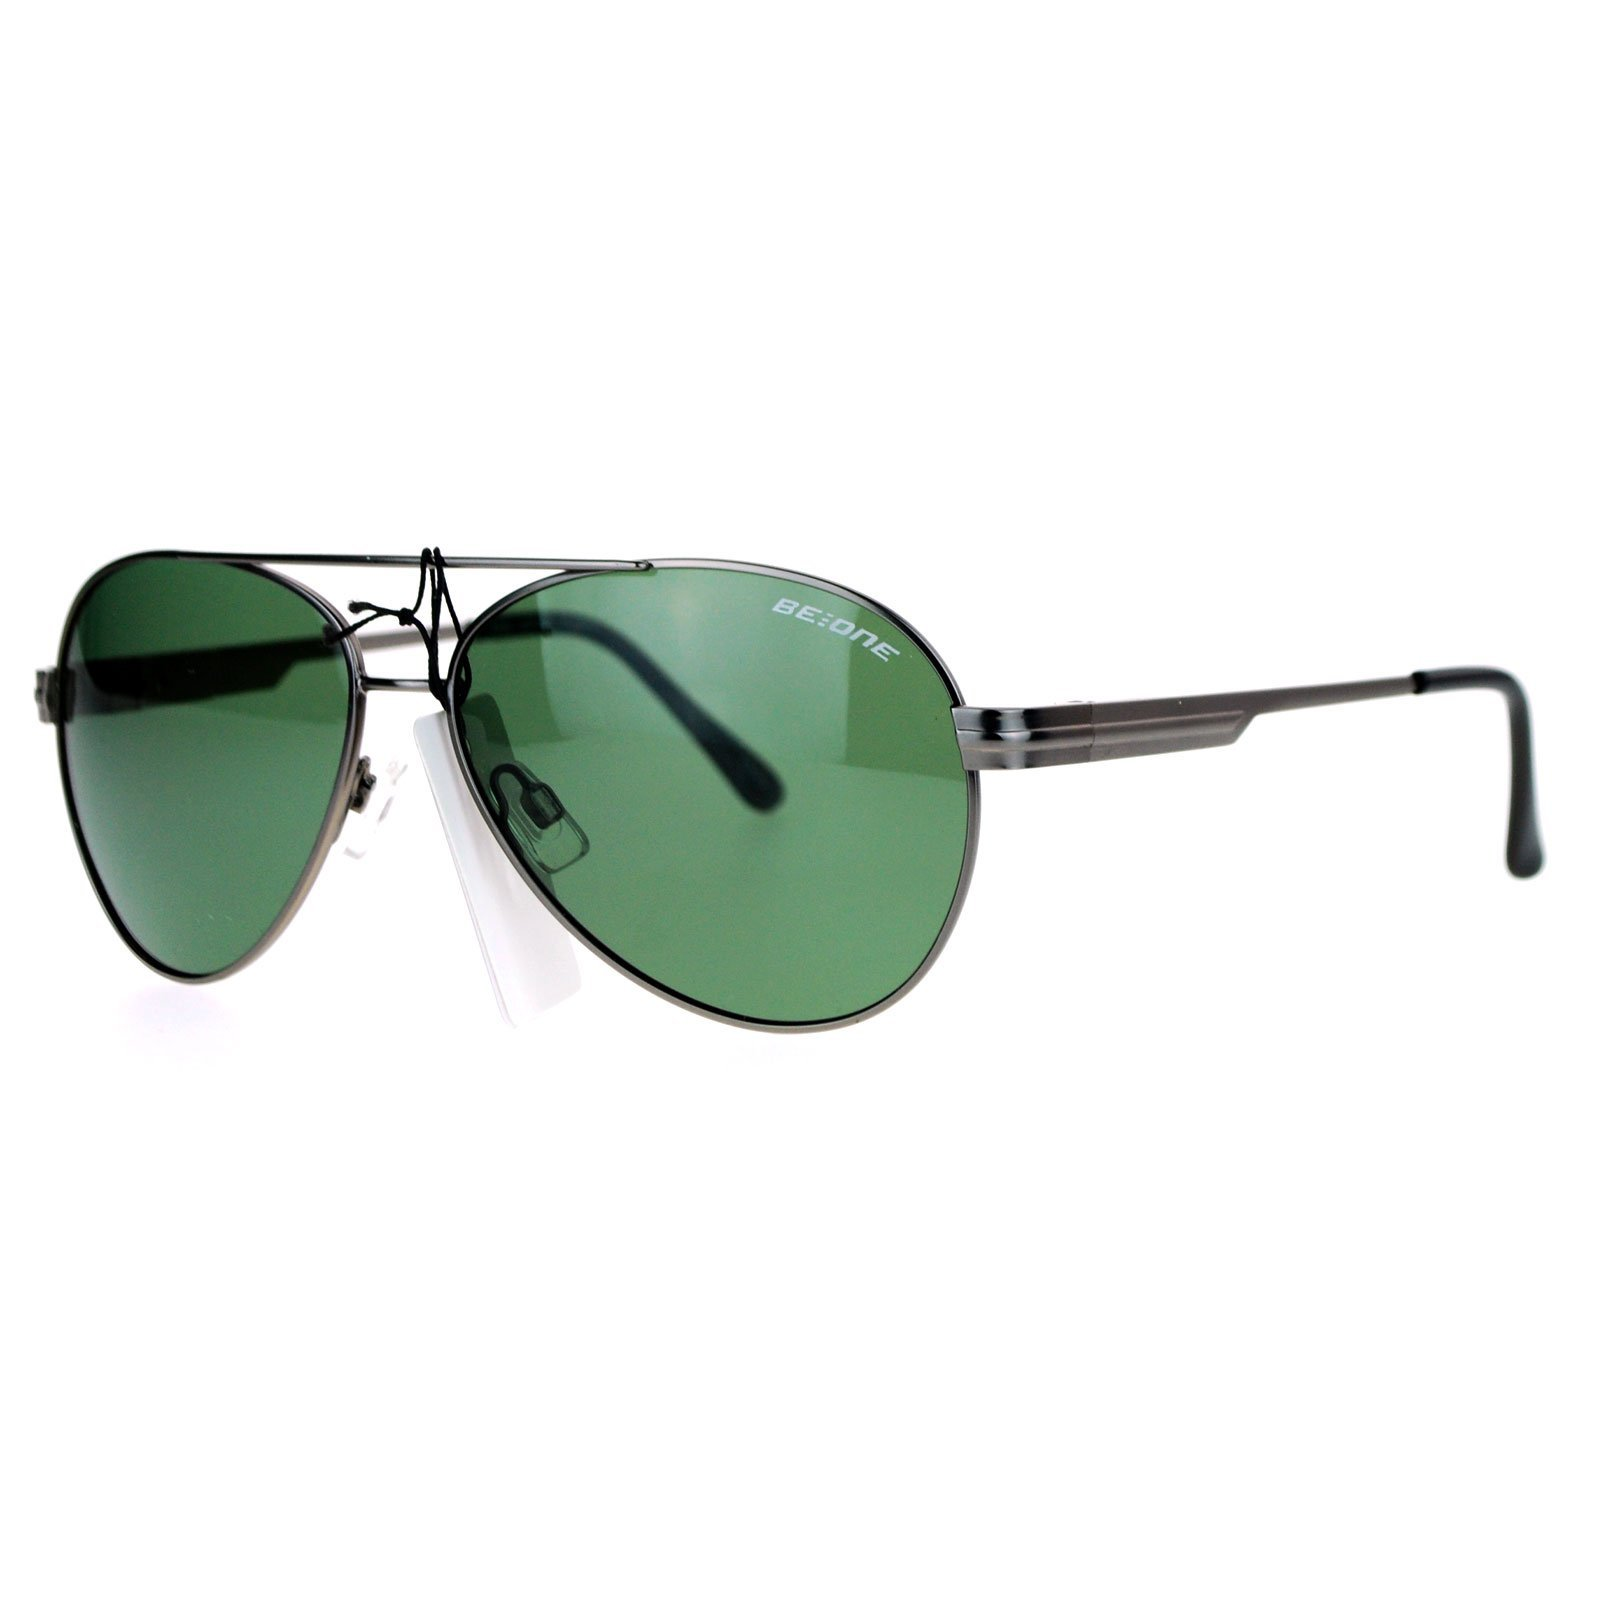 Mens Anti Glare Polarized Luxury Metal Aviator Sunglasses Gunmetal Green